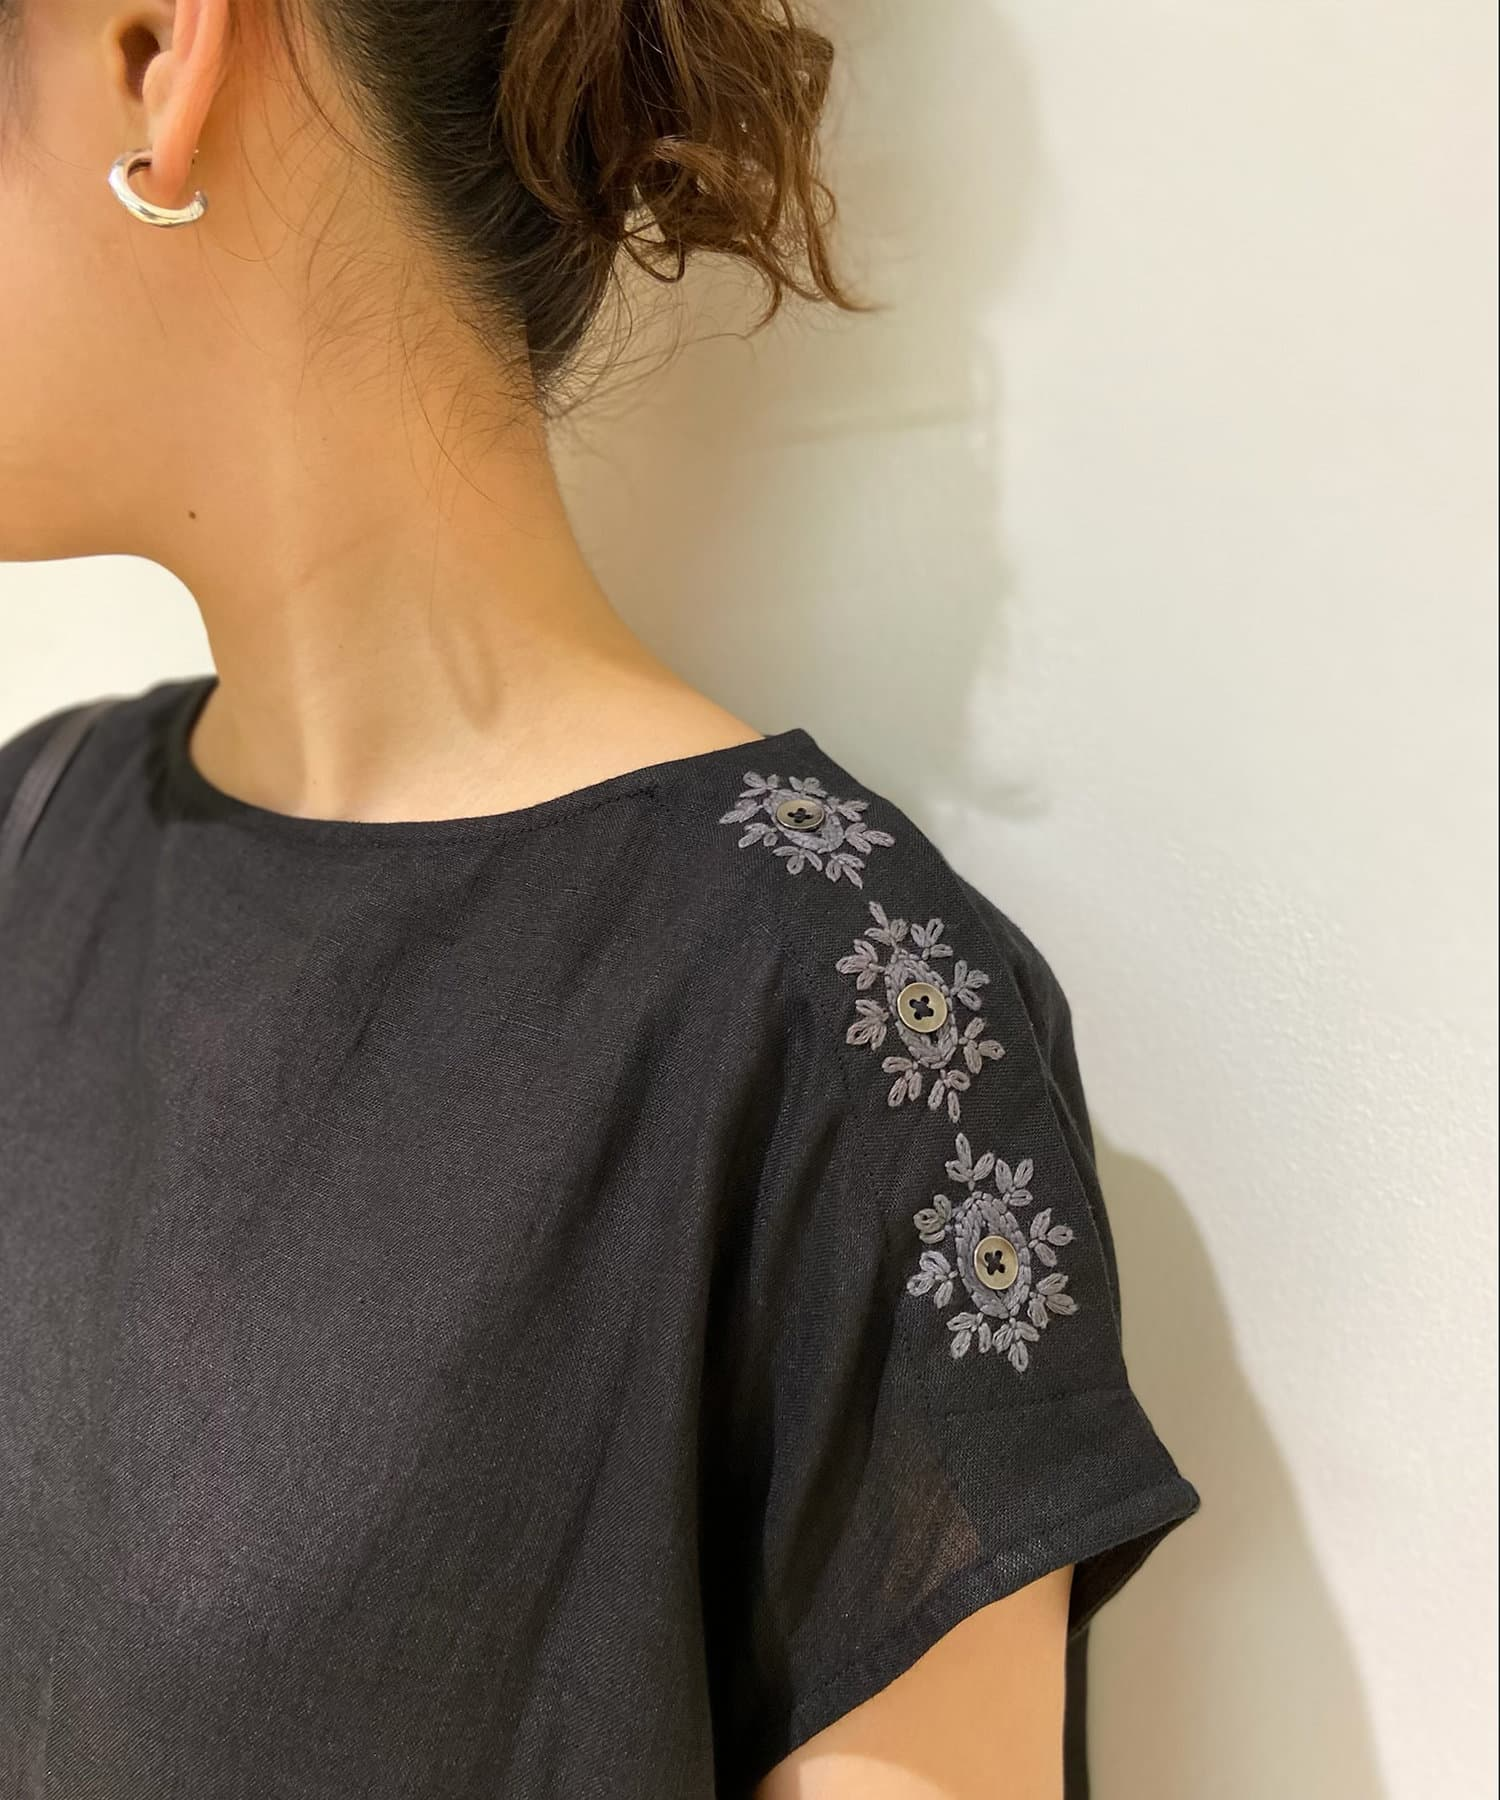 BEARDSLEY(ビアズリー) 釦ホール刺繍ワンピース